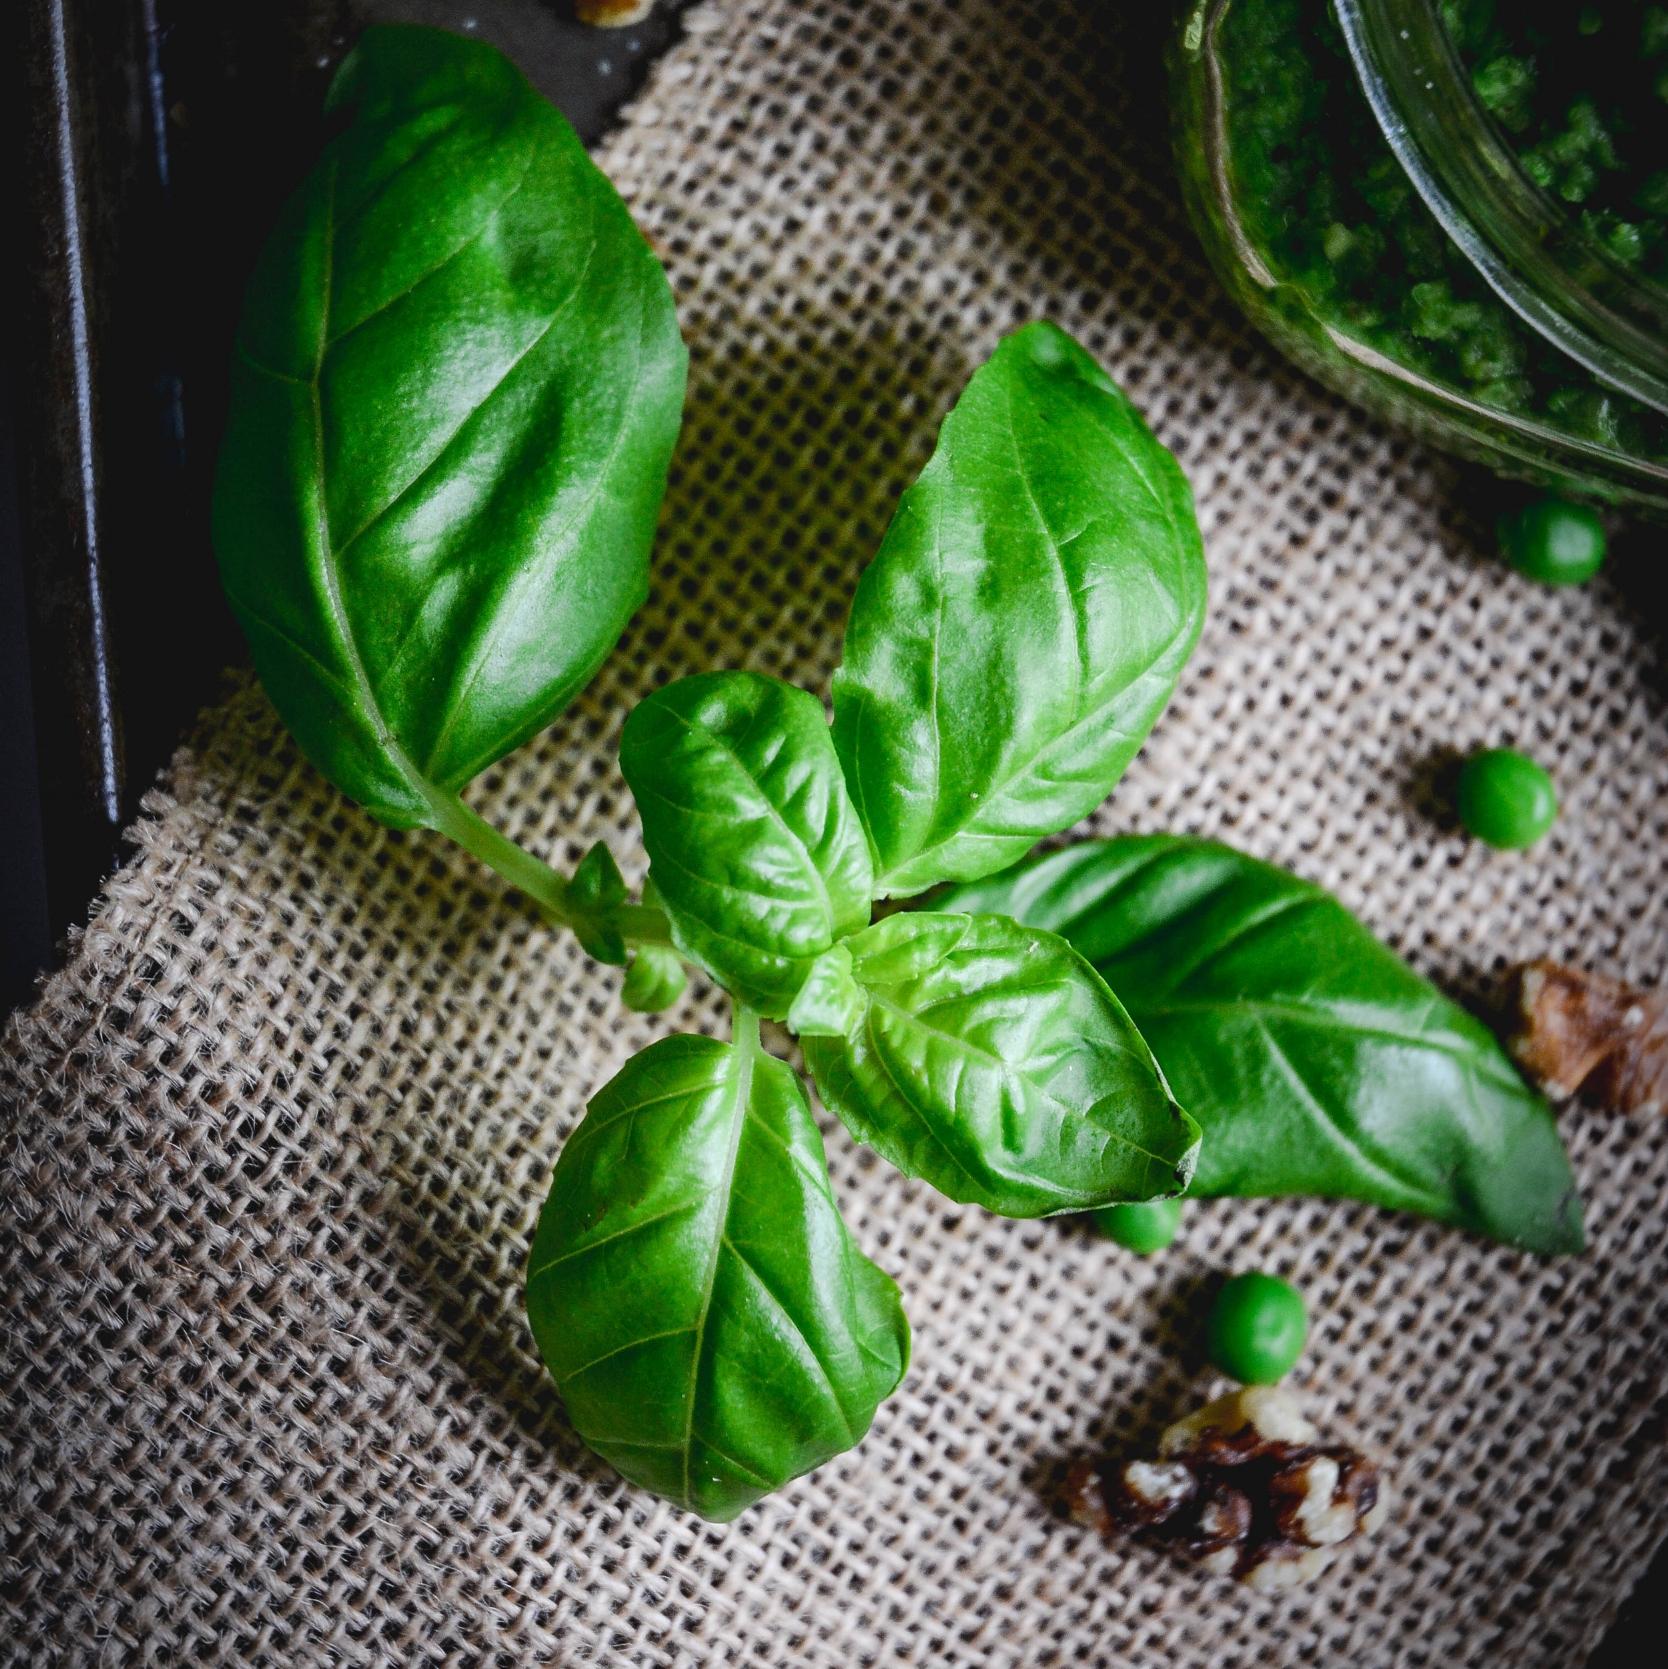 Basil, peas and walnuts on table